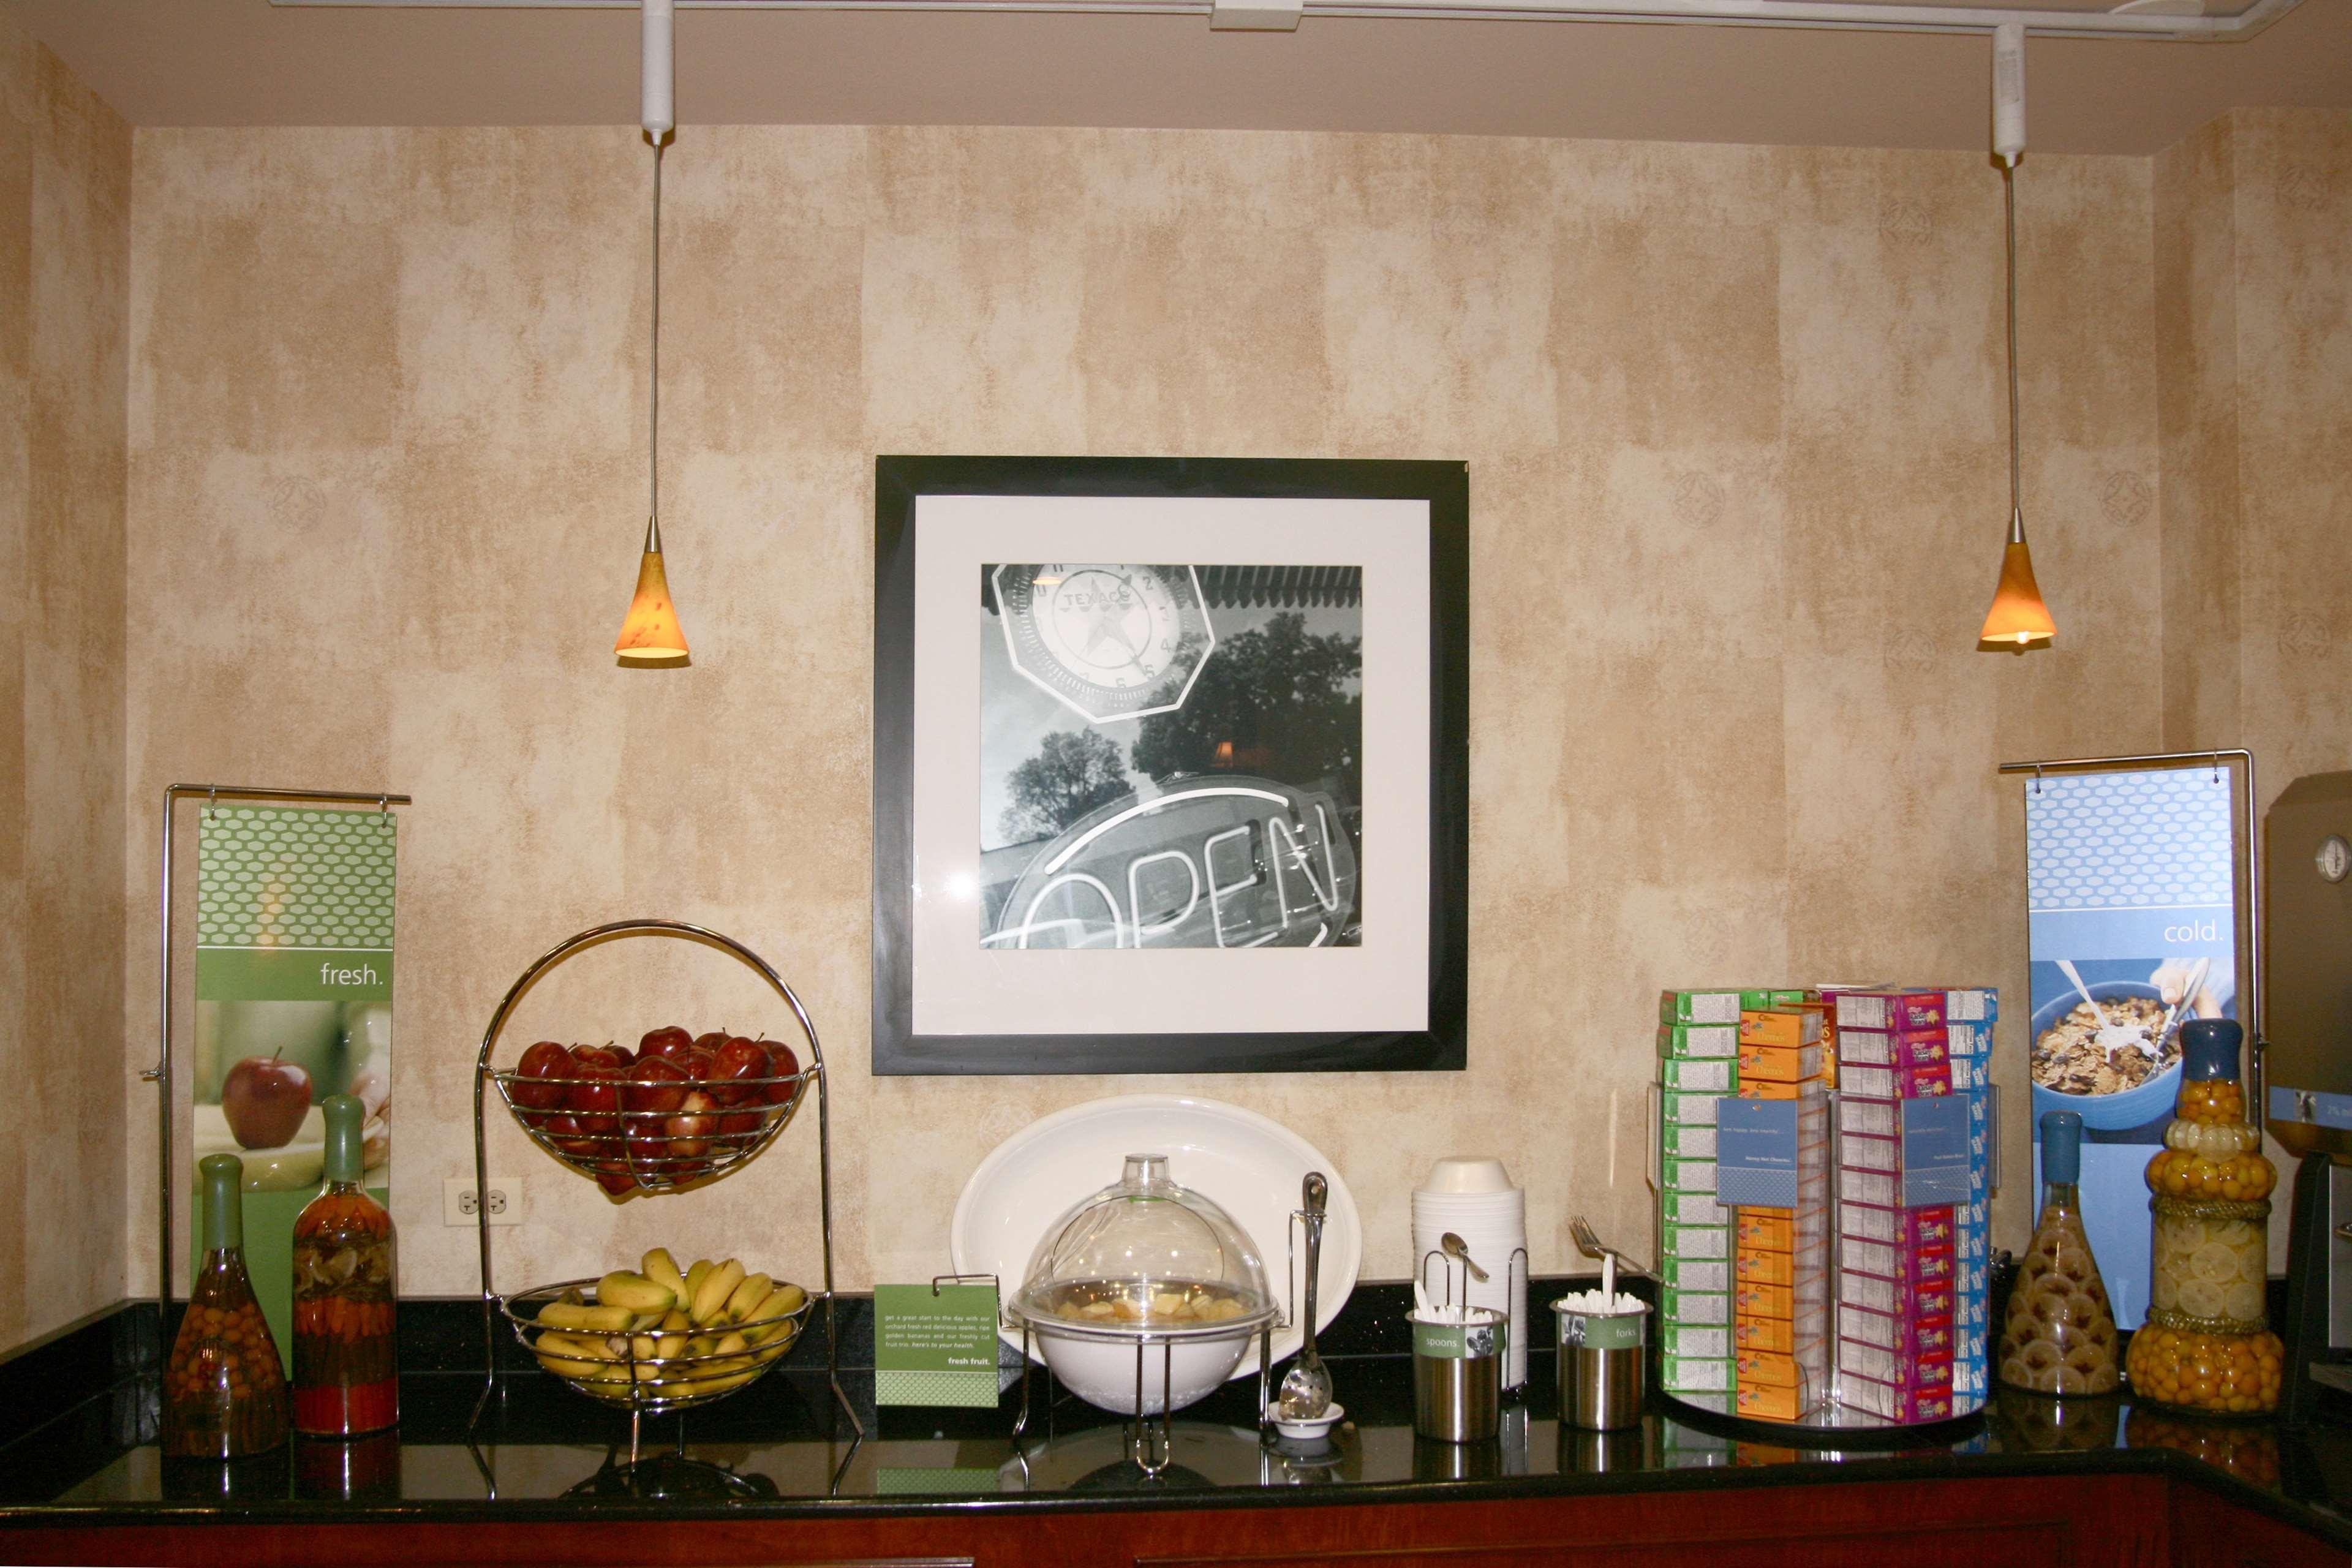 Hampton Inn & Suites Bolingbrook image 10